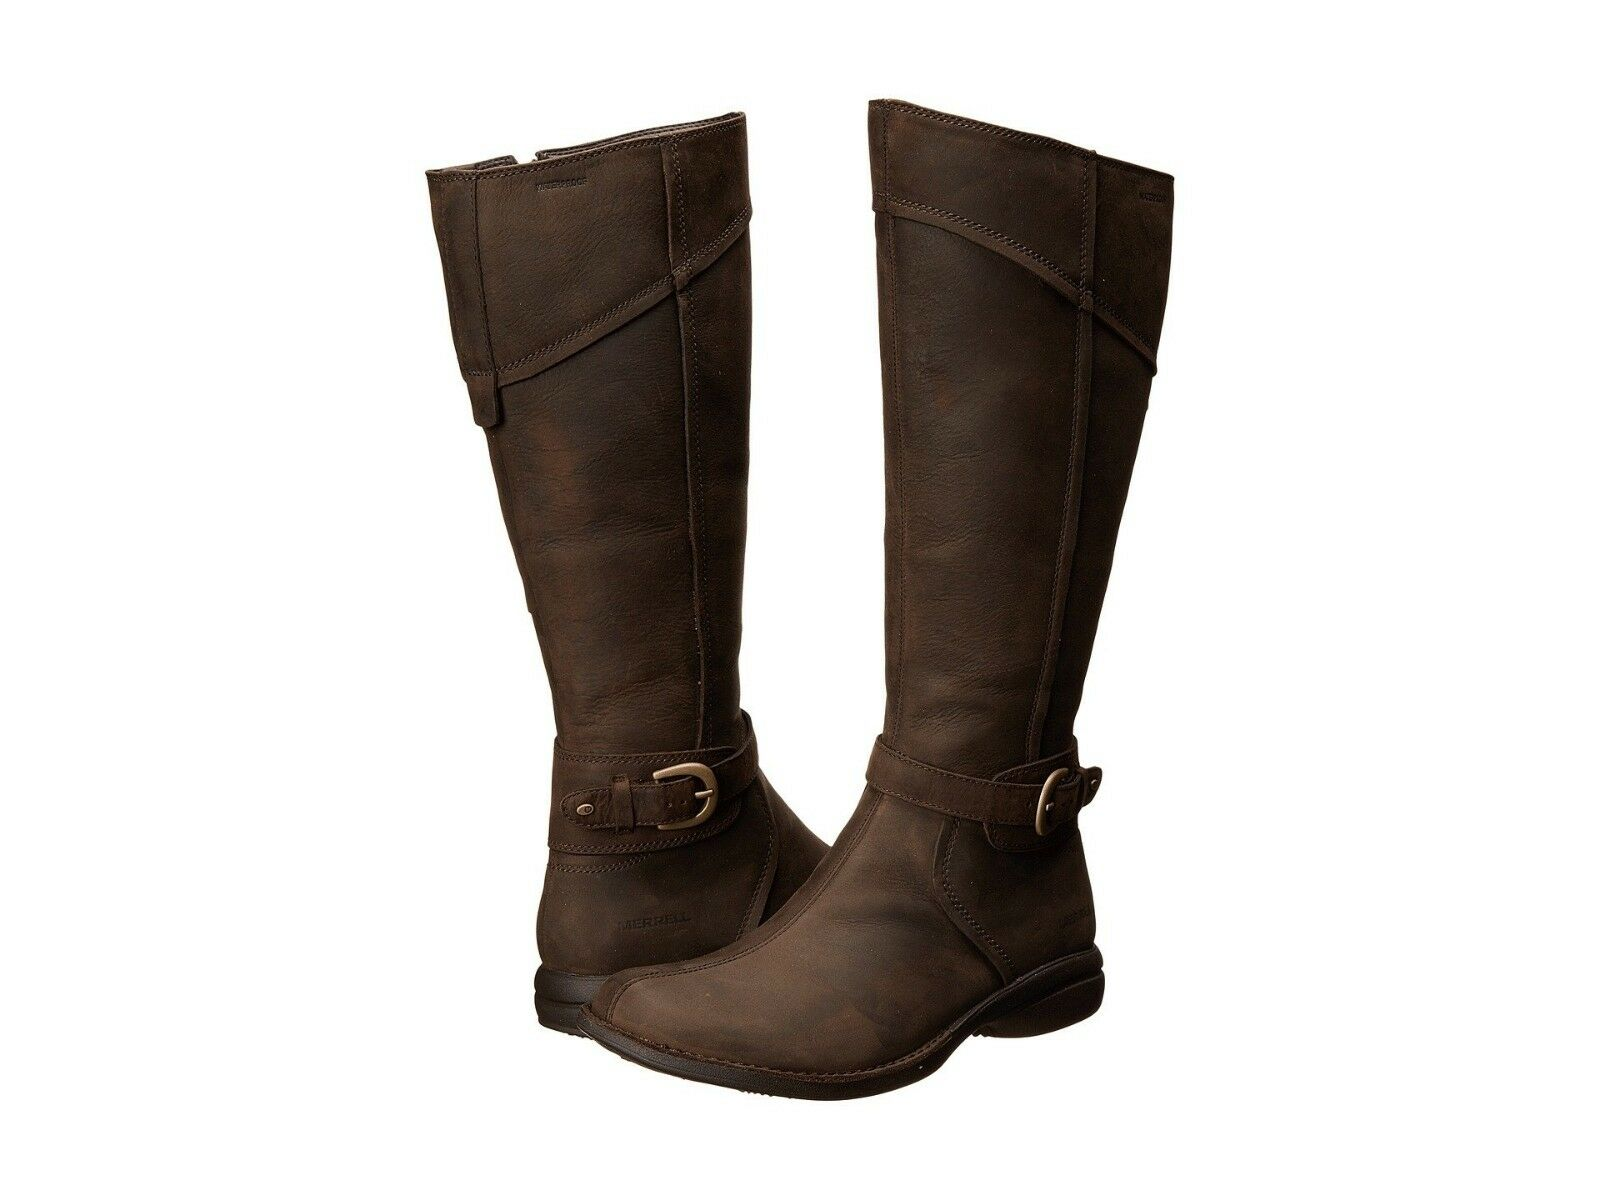 NEW Merrell Women's Women's Women's Captiva Buckle-Up Waterproof Boots, Size Women 5  220 60a1ca